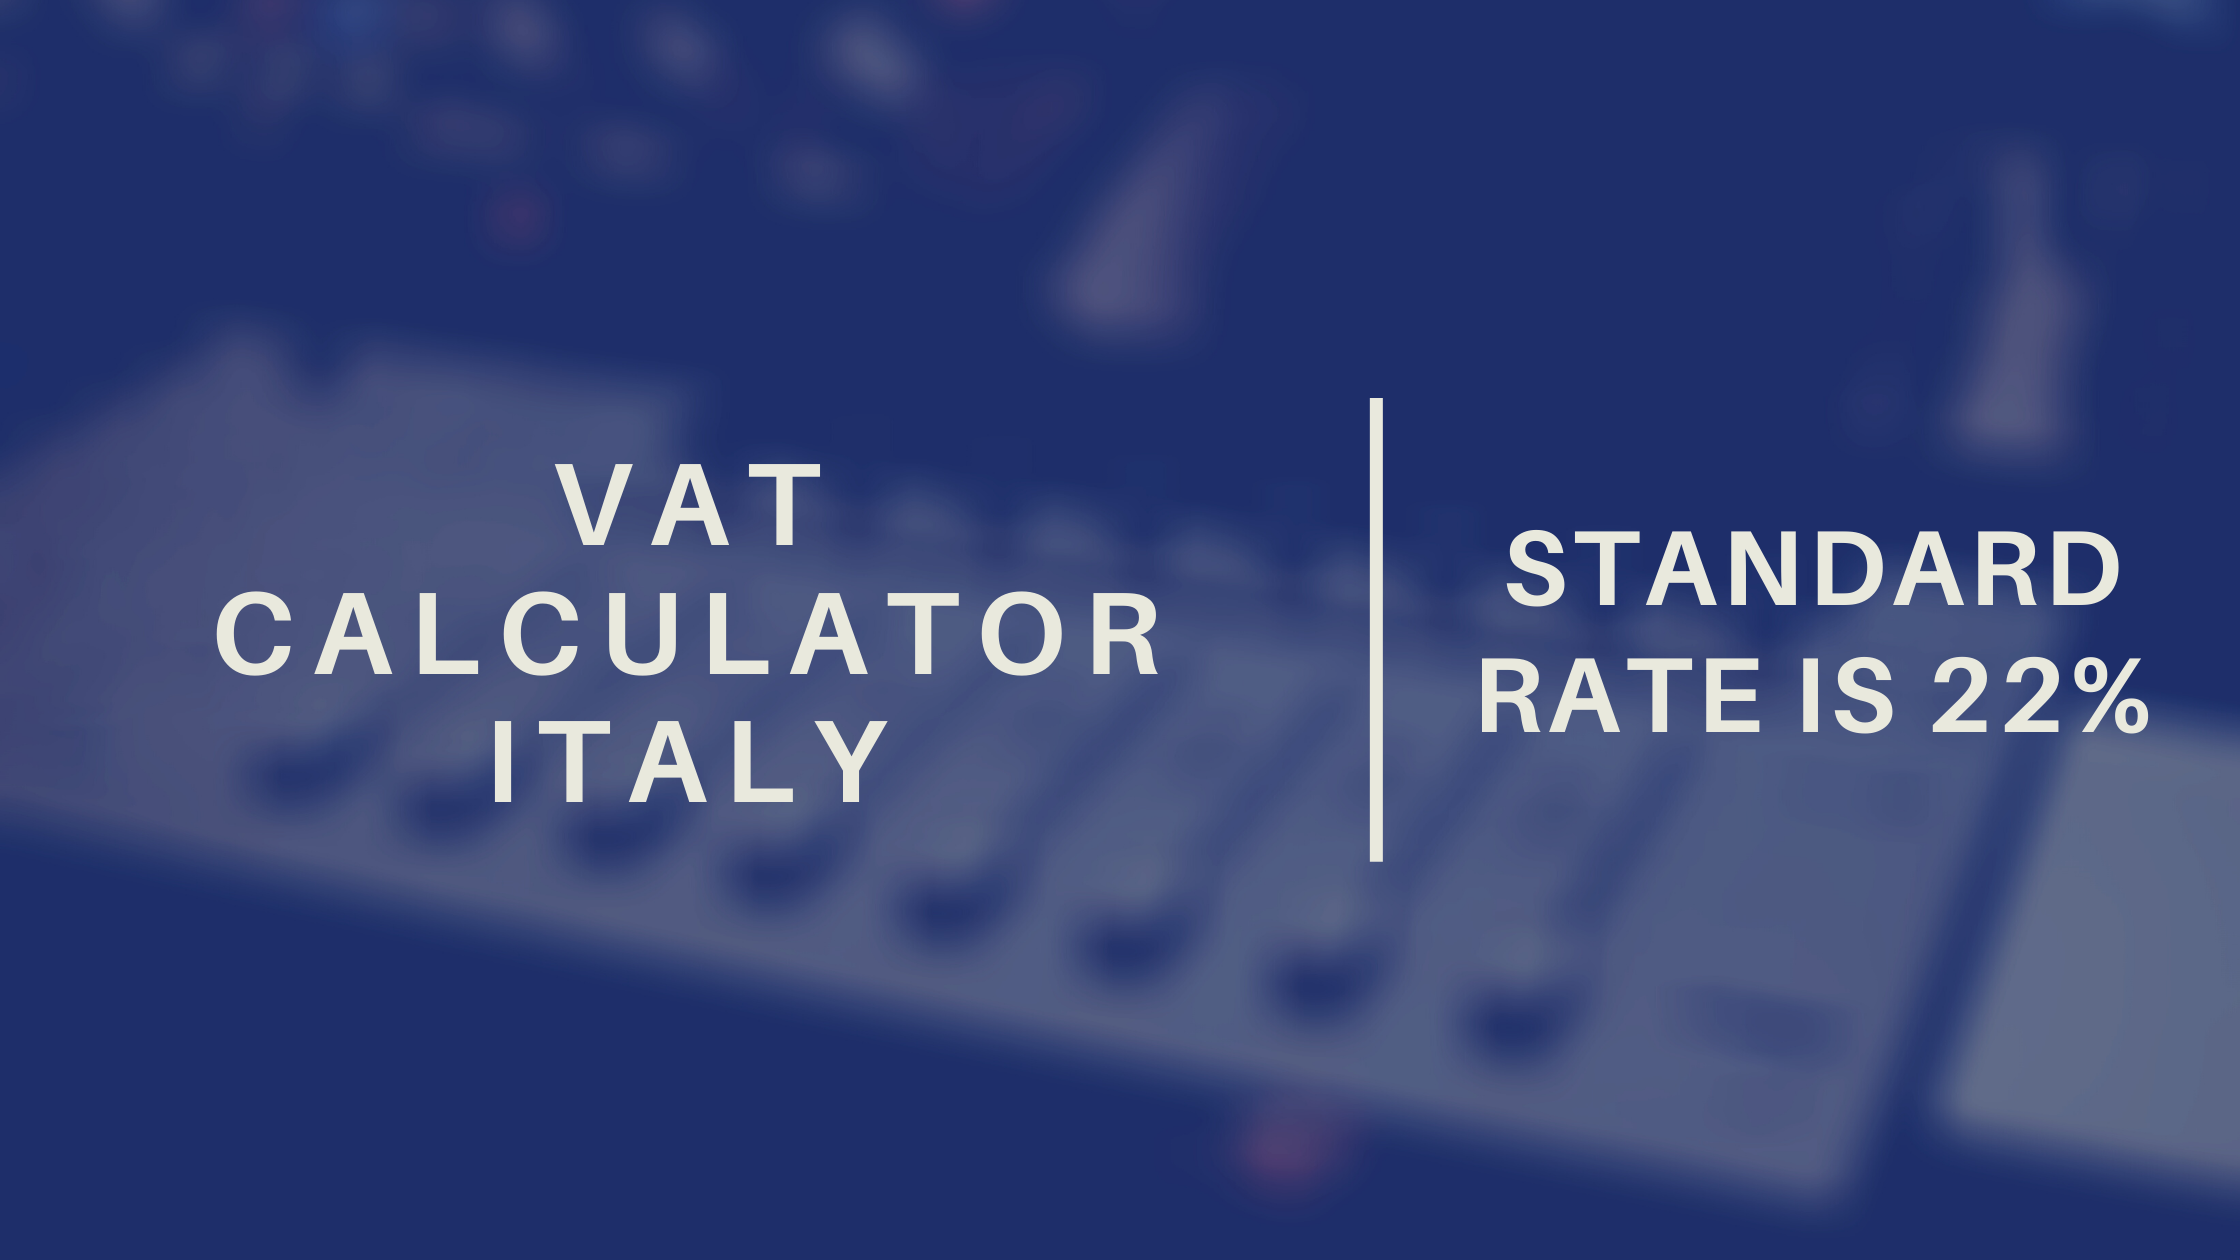 Vat Calculator Italy